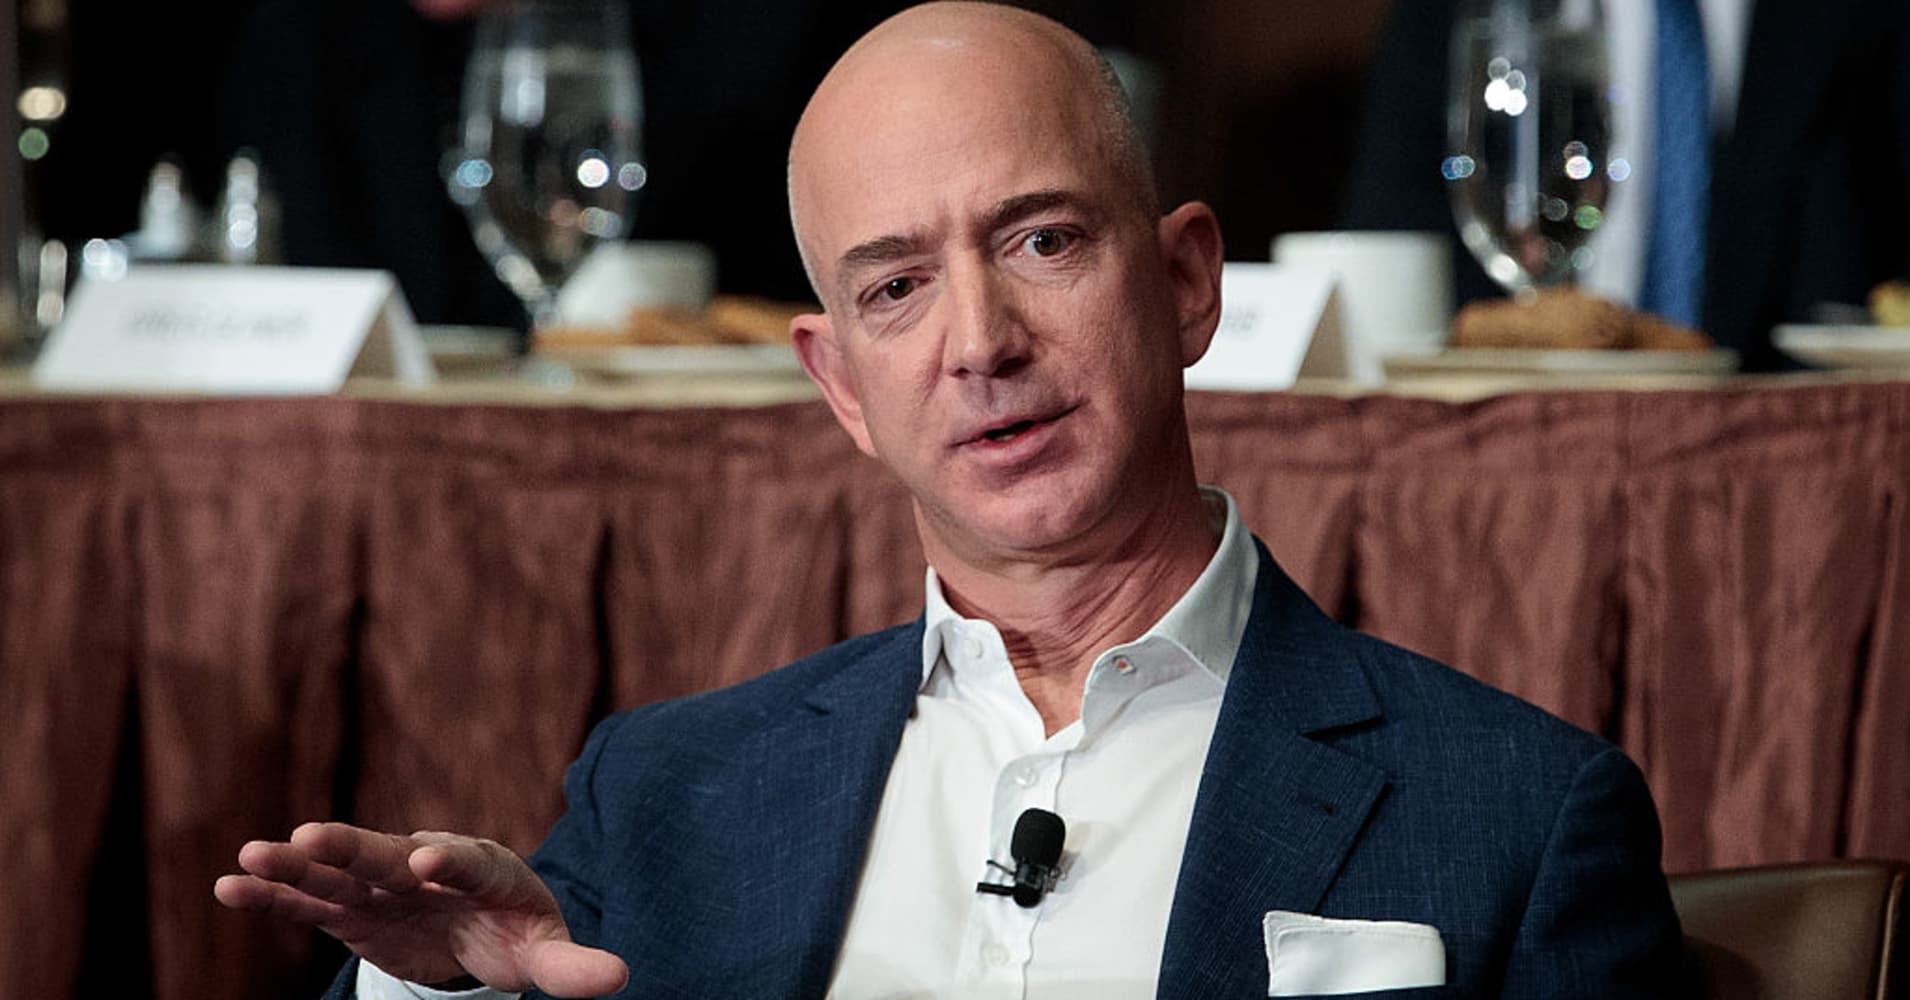 Jeff Bezos, Chairman and founder of Amazon